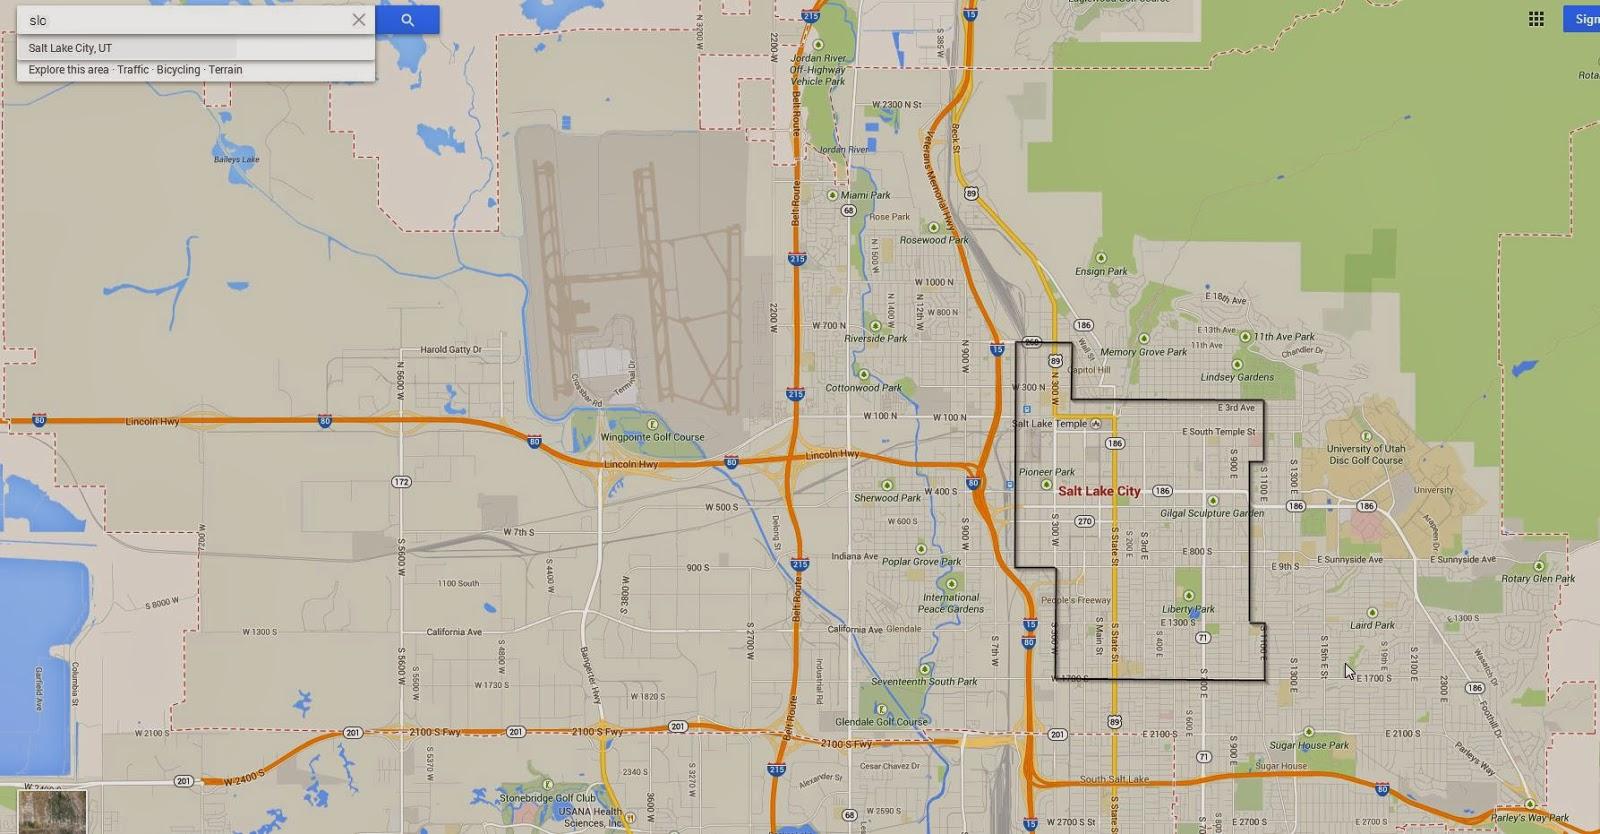 Salt lake city utah google maps infolakes google fiber usa map wall hd 2018 salt lake city publicscrutiny Choice Image